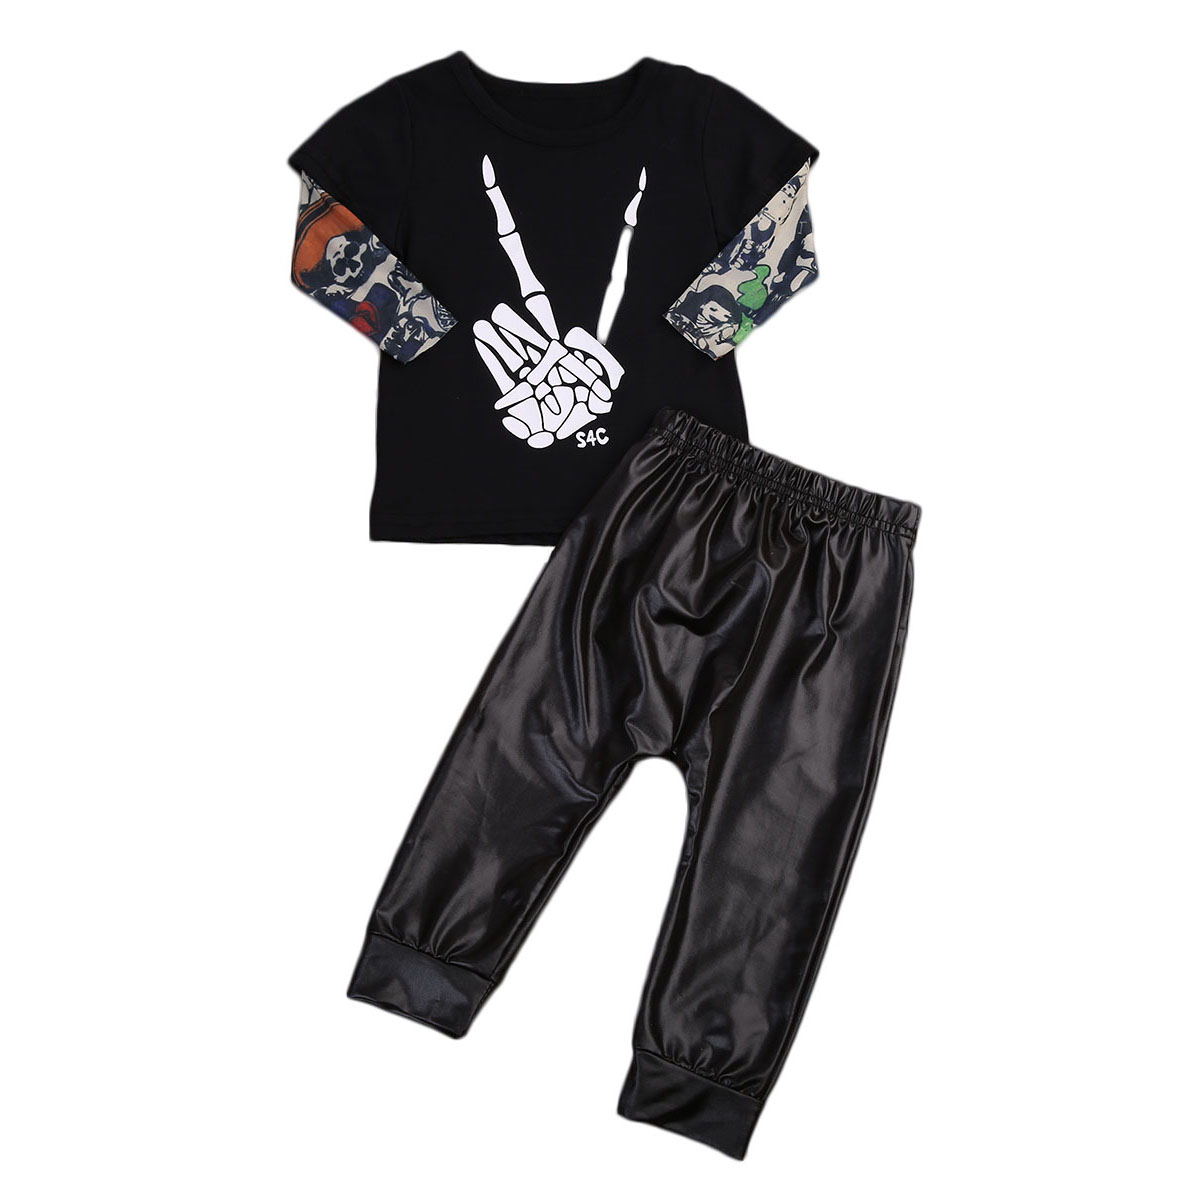 2PCS Infant Toddler Newborn Kids Baby Boys Cool Printed T-shirt Leather Long Pants Biker Boys Outfits Clothes Set